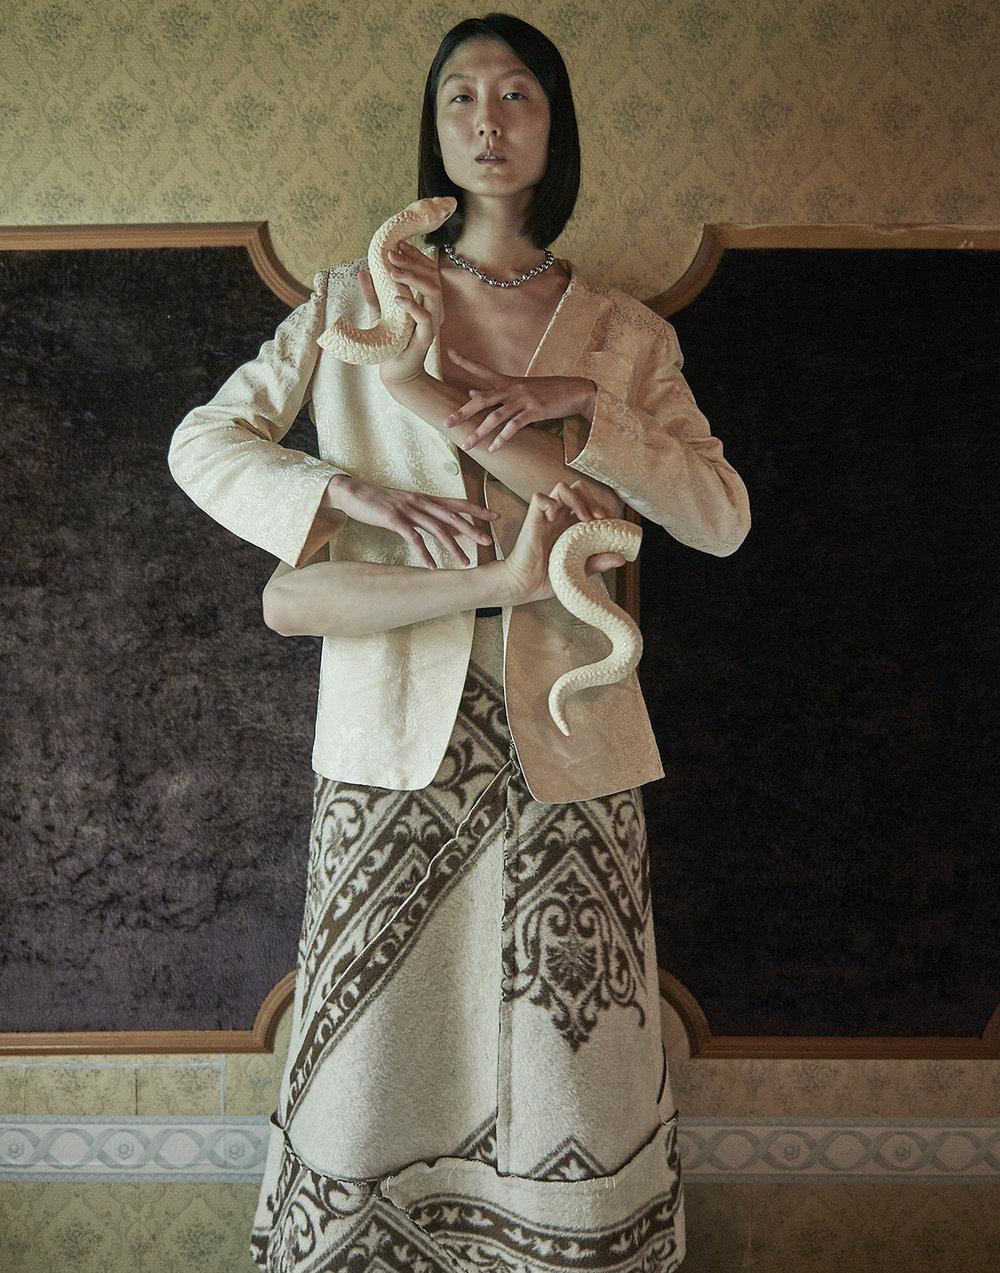 Woman Shirts  Comme des Garcons   Ceramic:  Kilala Iriyama  @kilala72